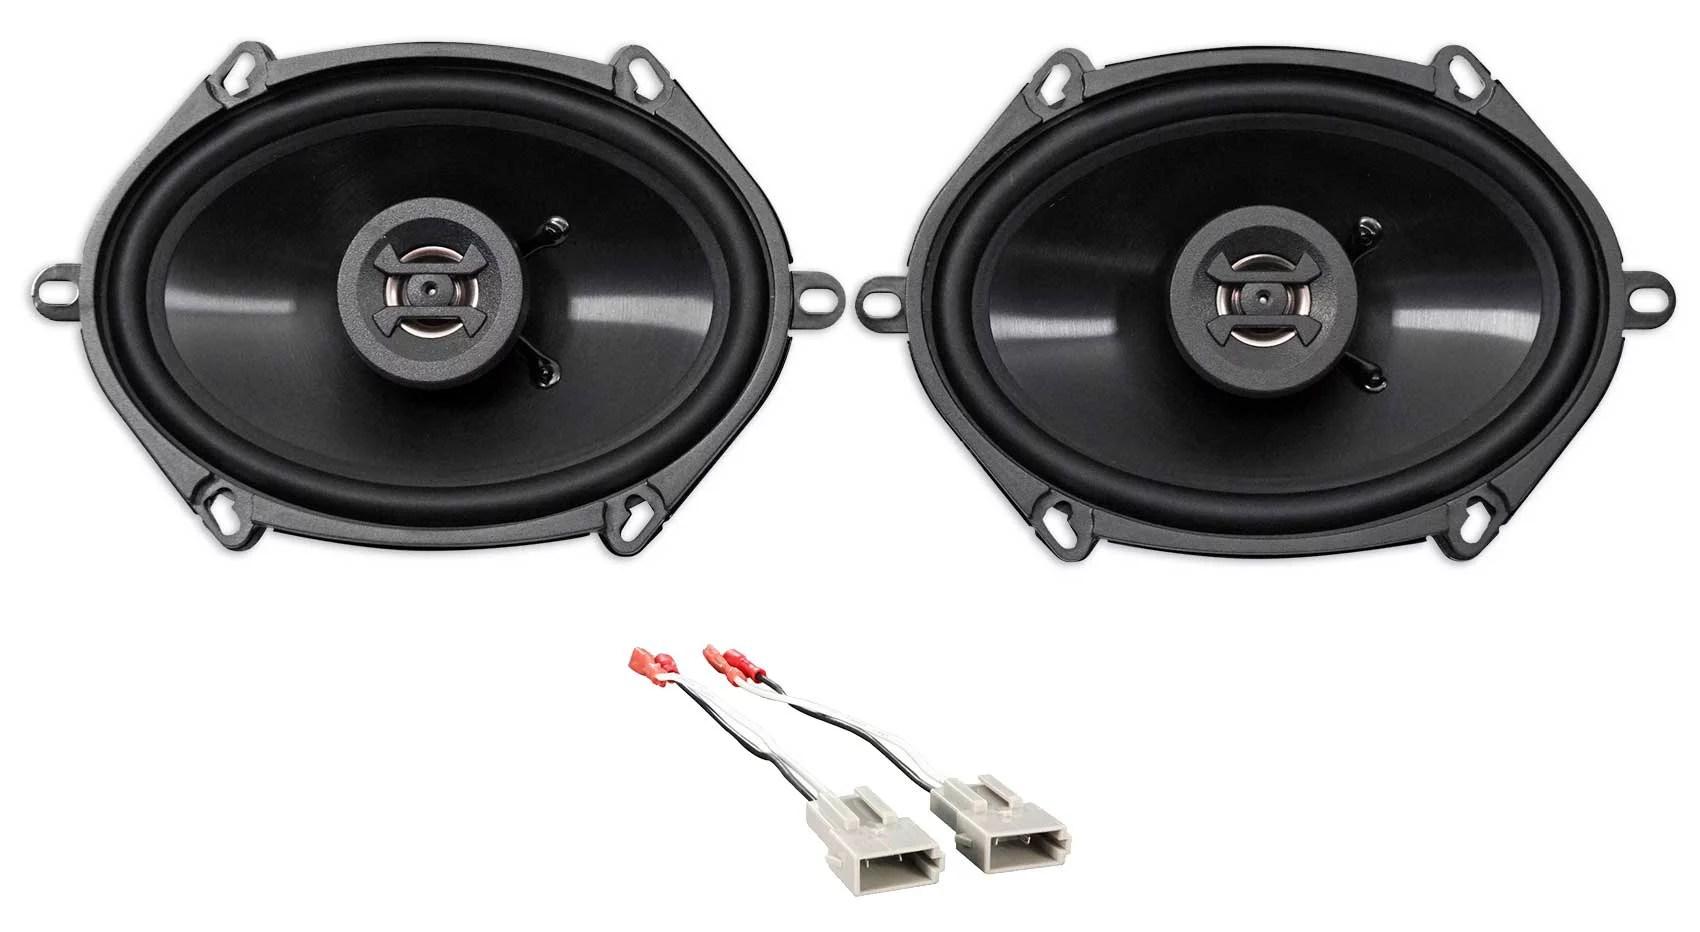 hight resolution of rear hifonics factory speaker replacement kit for 1994 1997 ford ranger walmart com